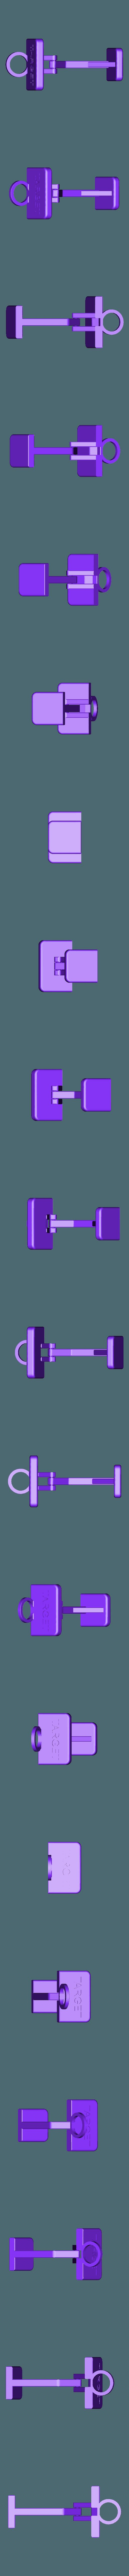 BasketballHoop_B.stl Download free STL file Basketball Hoop Stand, All in One • 3D print object, LGBU